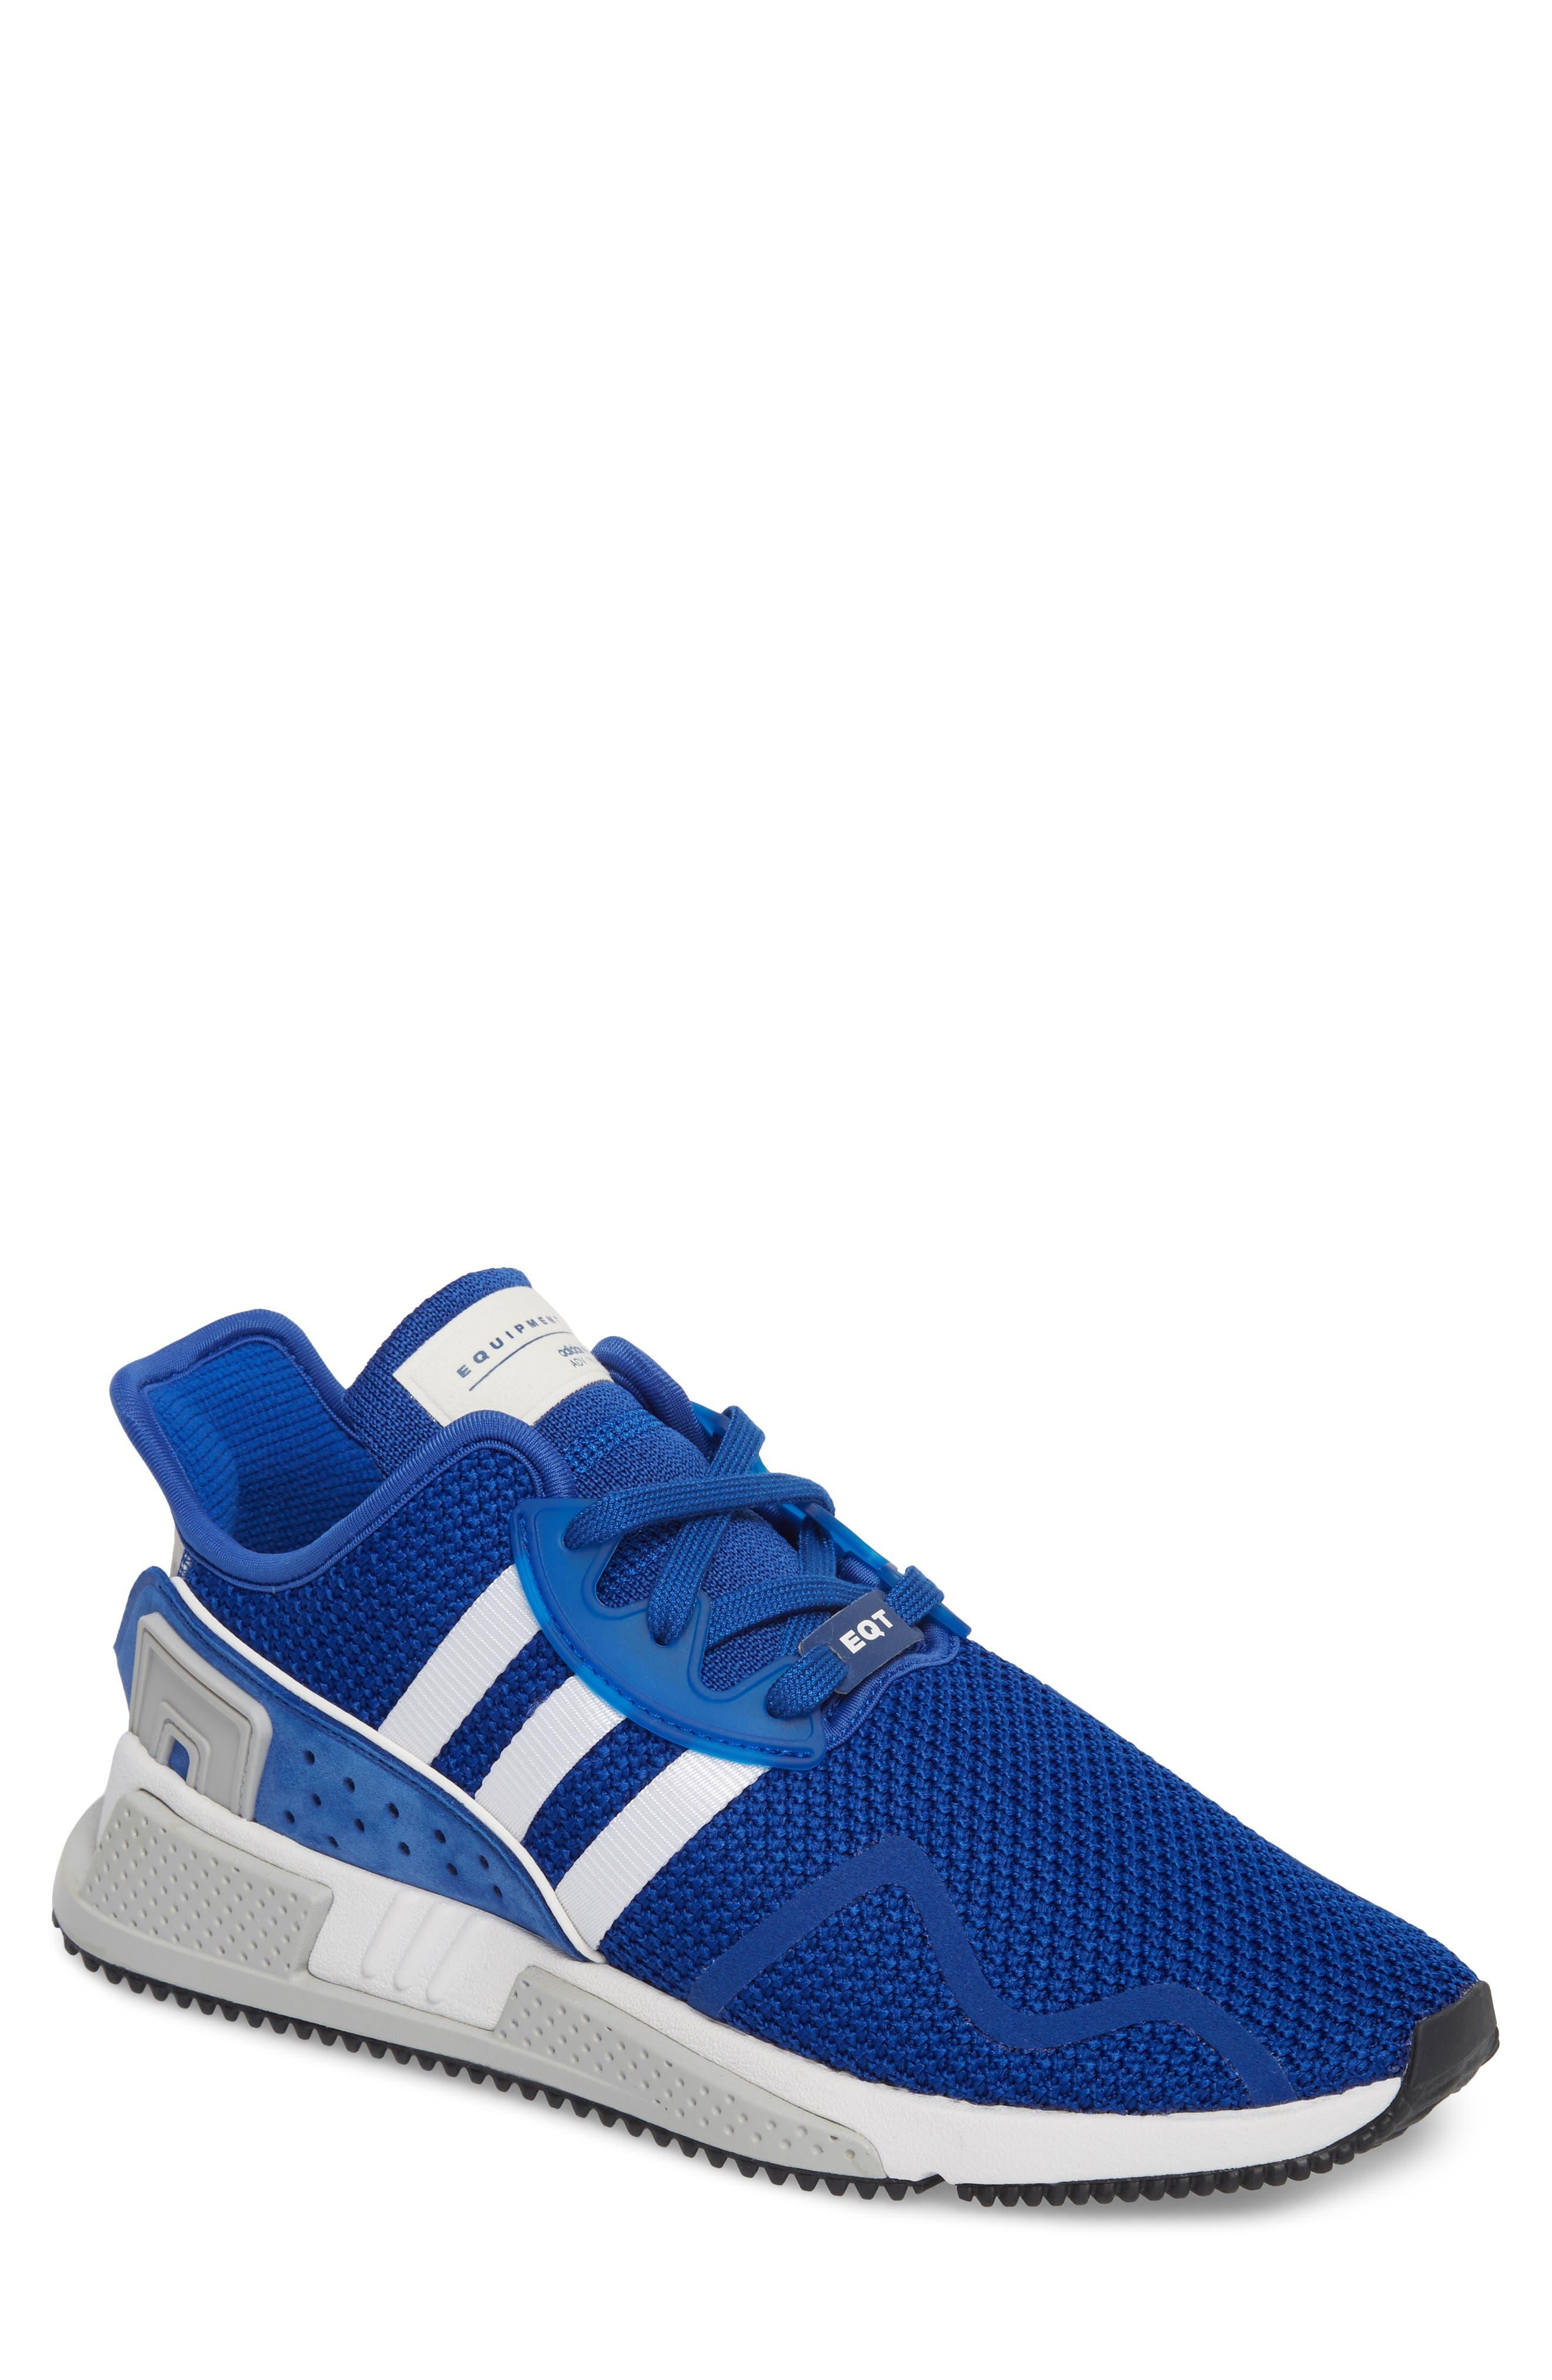 EQT Cushion ADV Sneaker,                             Main thumbnail 1, color,                             400